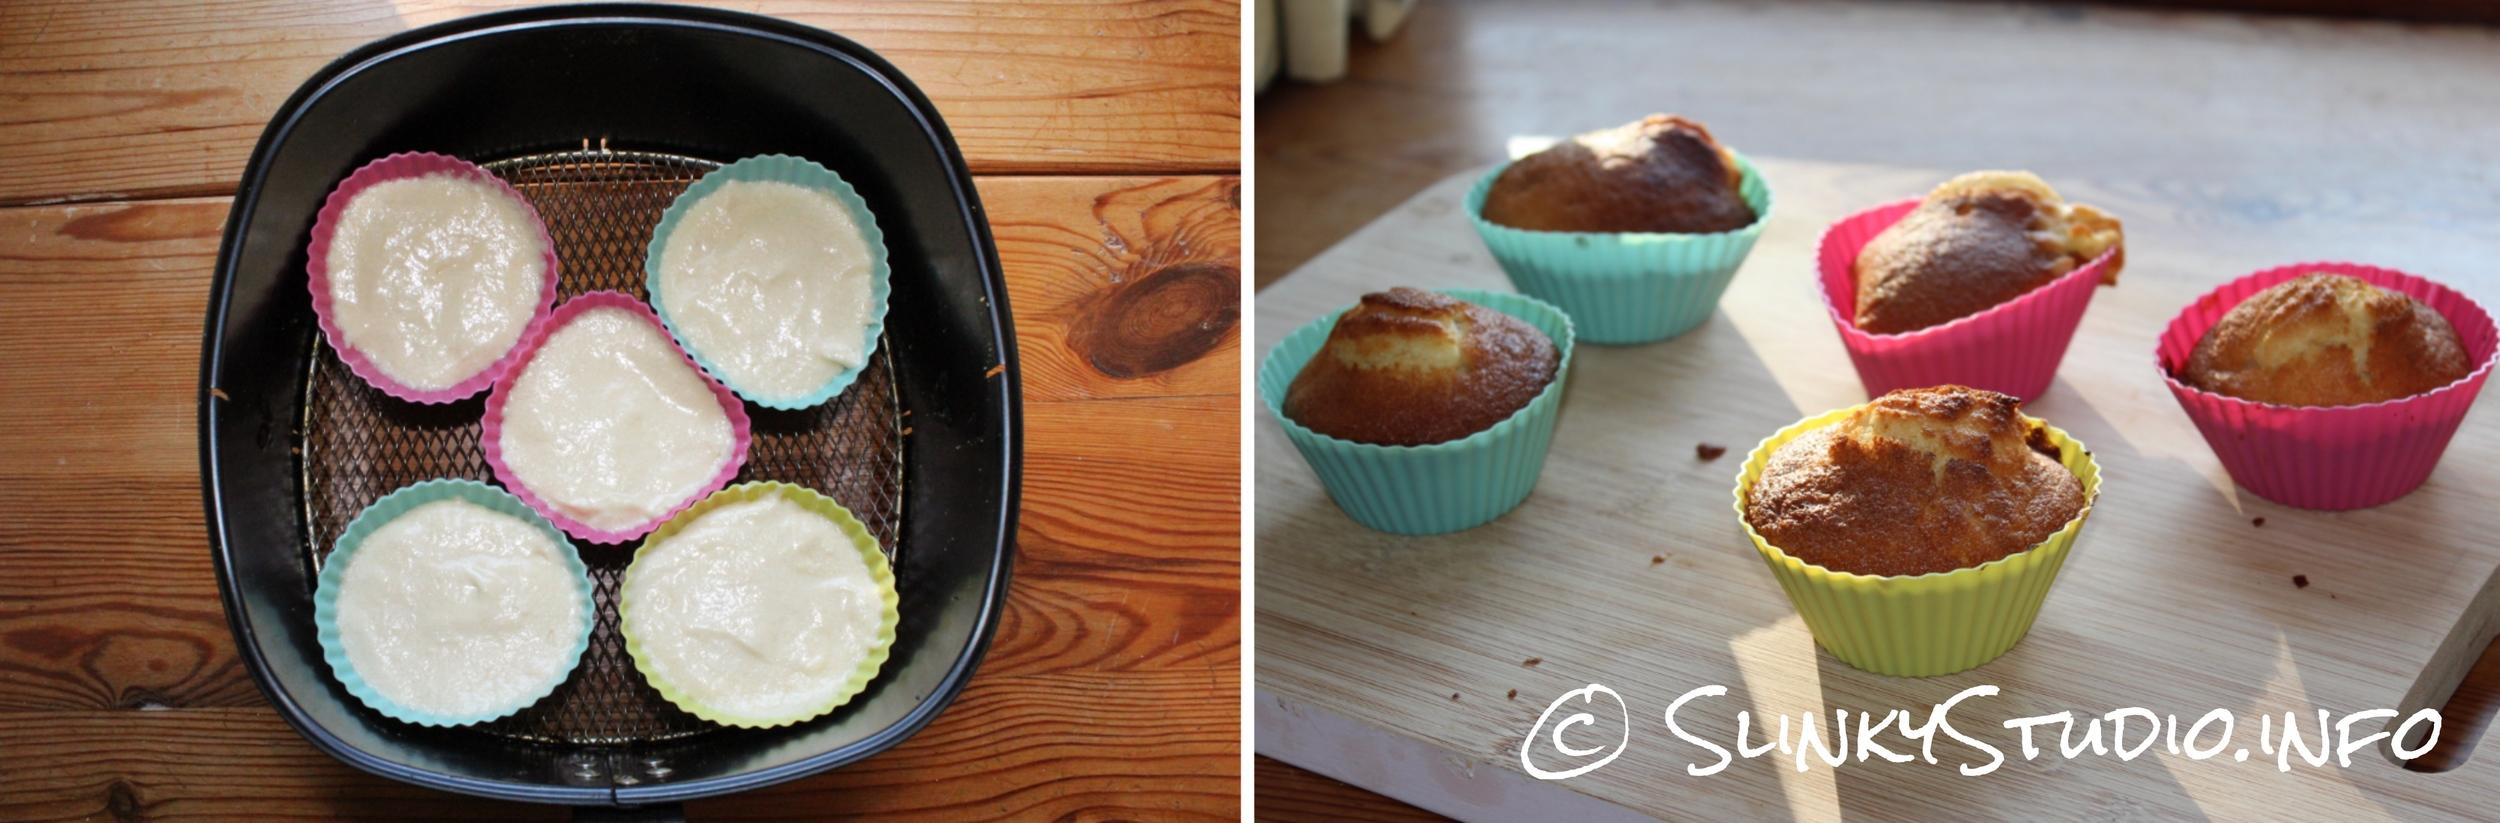 Philips Viva Airfryer Vanilla Cupcakes Results